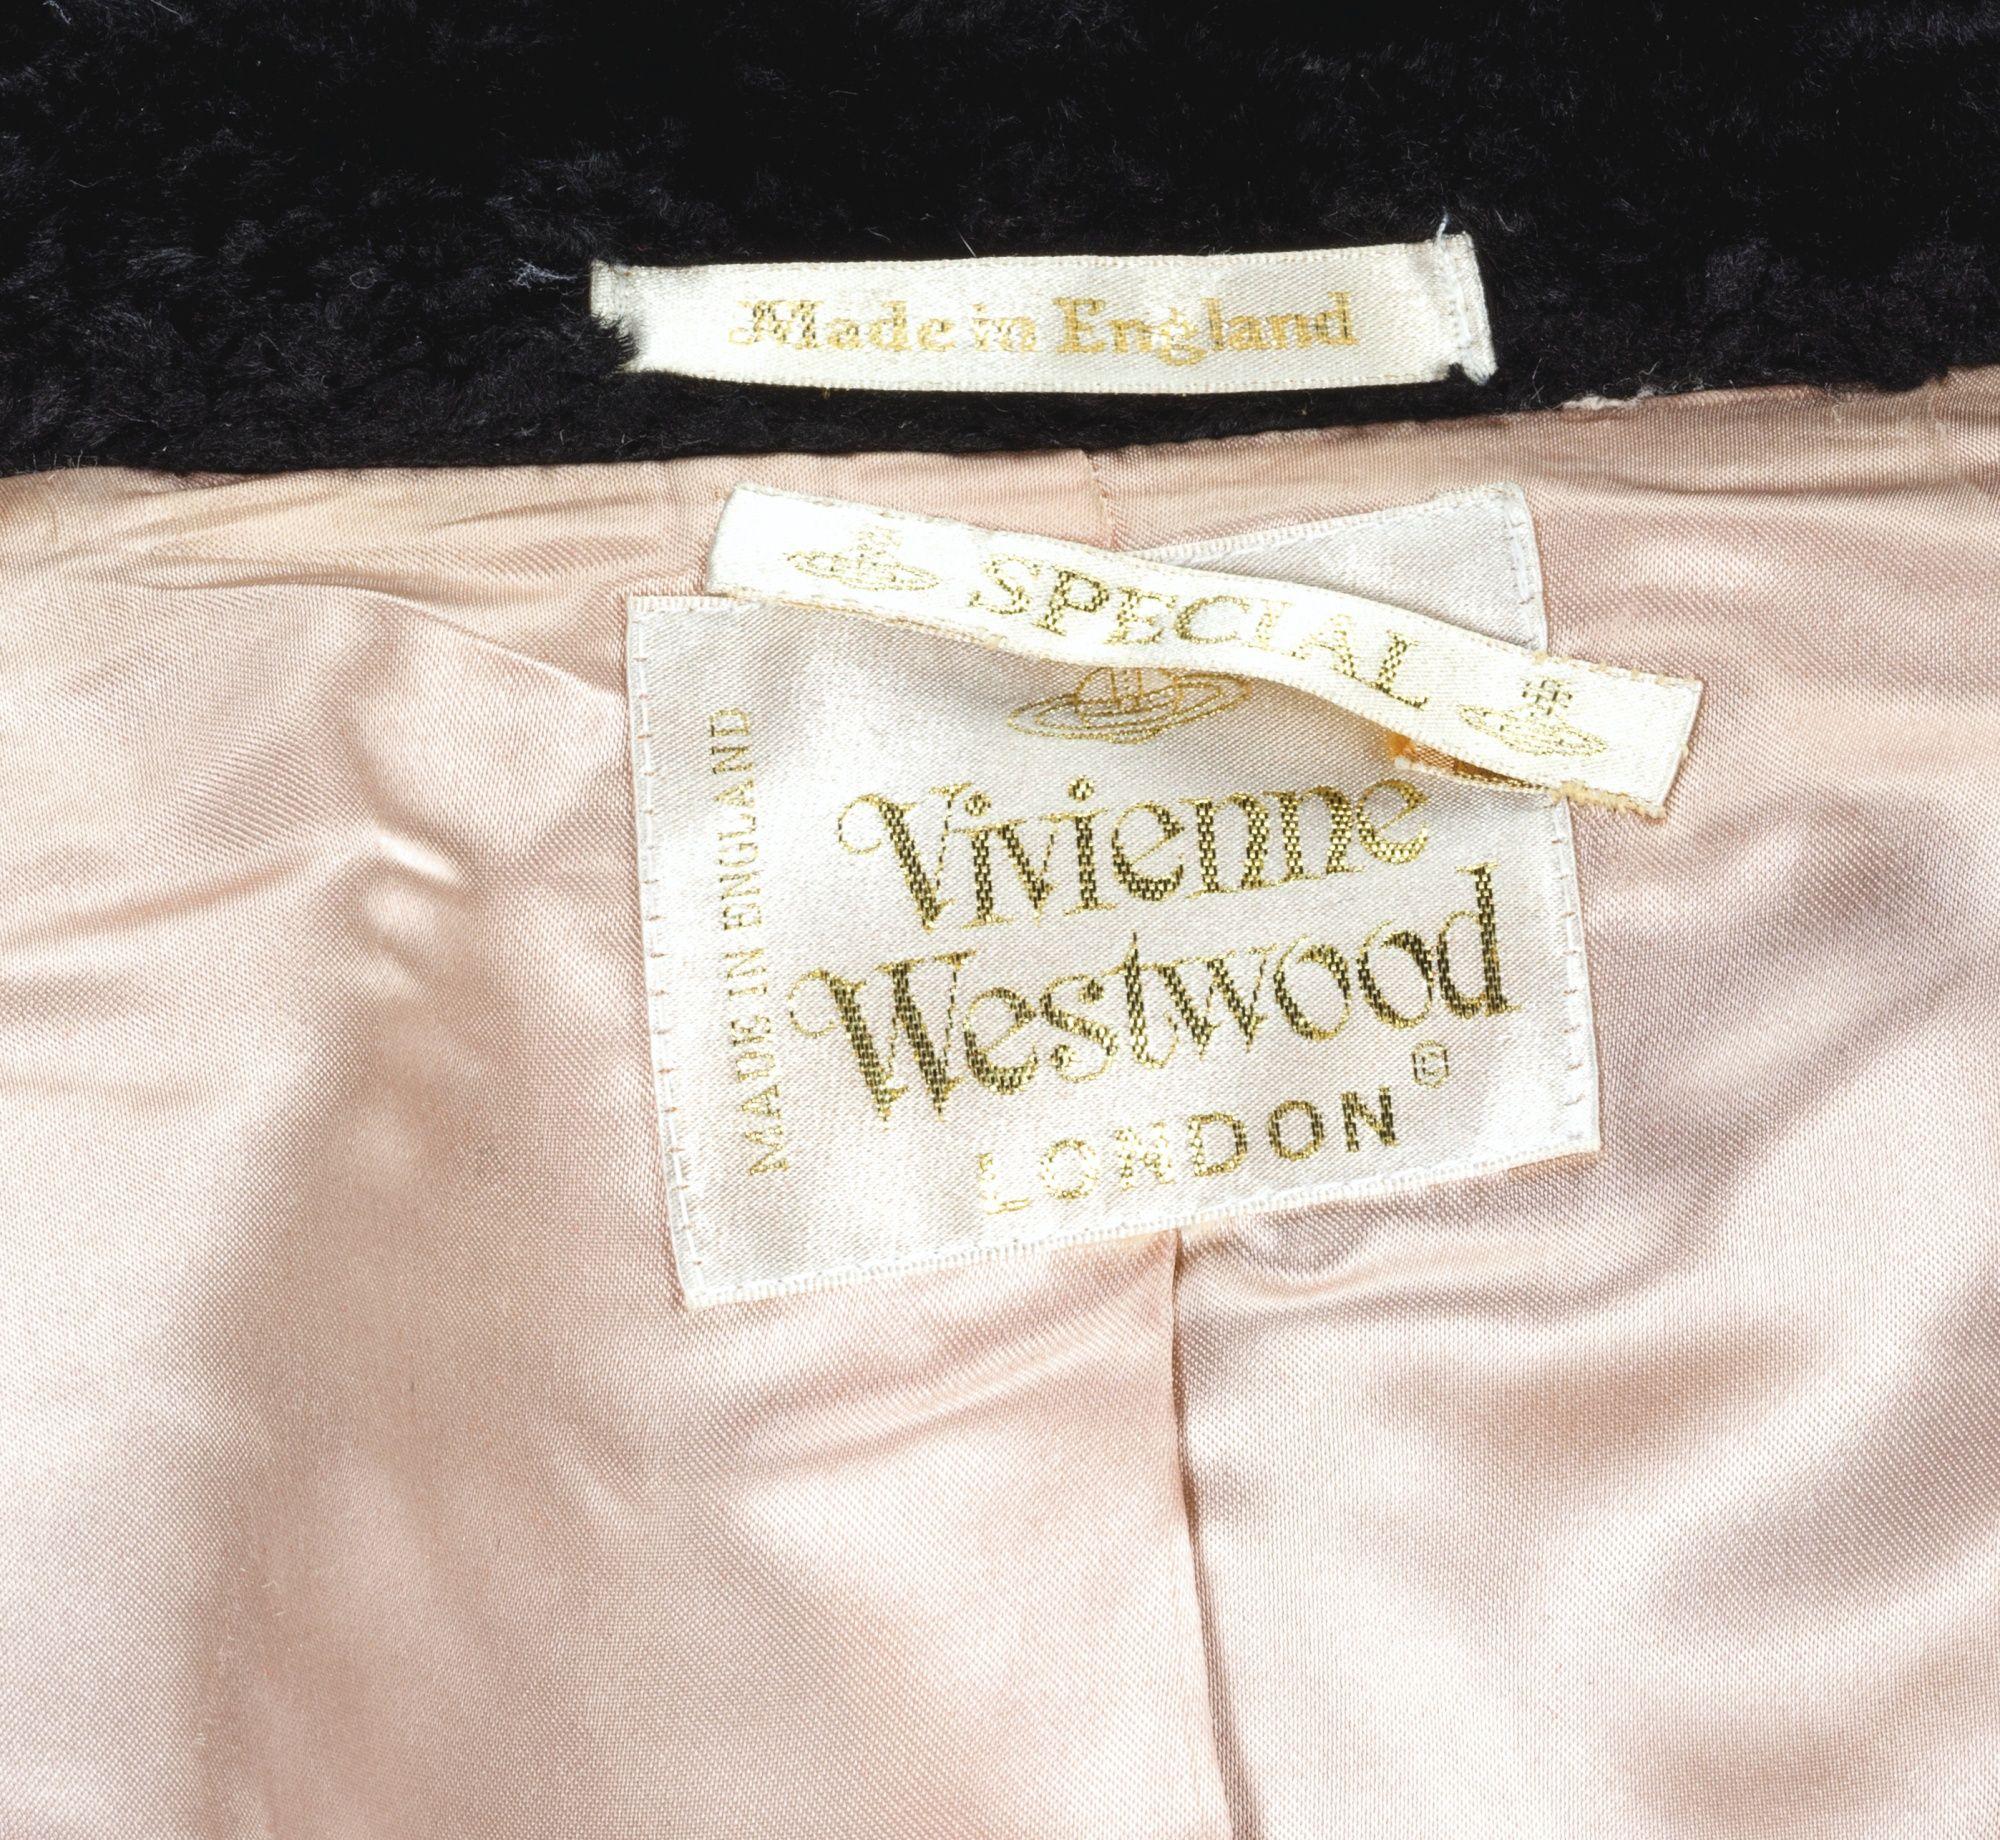 Vivienne Westwood Automne Hiver 1994 1995 Lot Clothing Tags Fashion Identity Fashion Branding